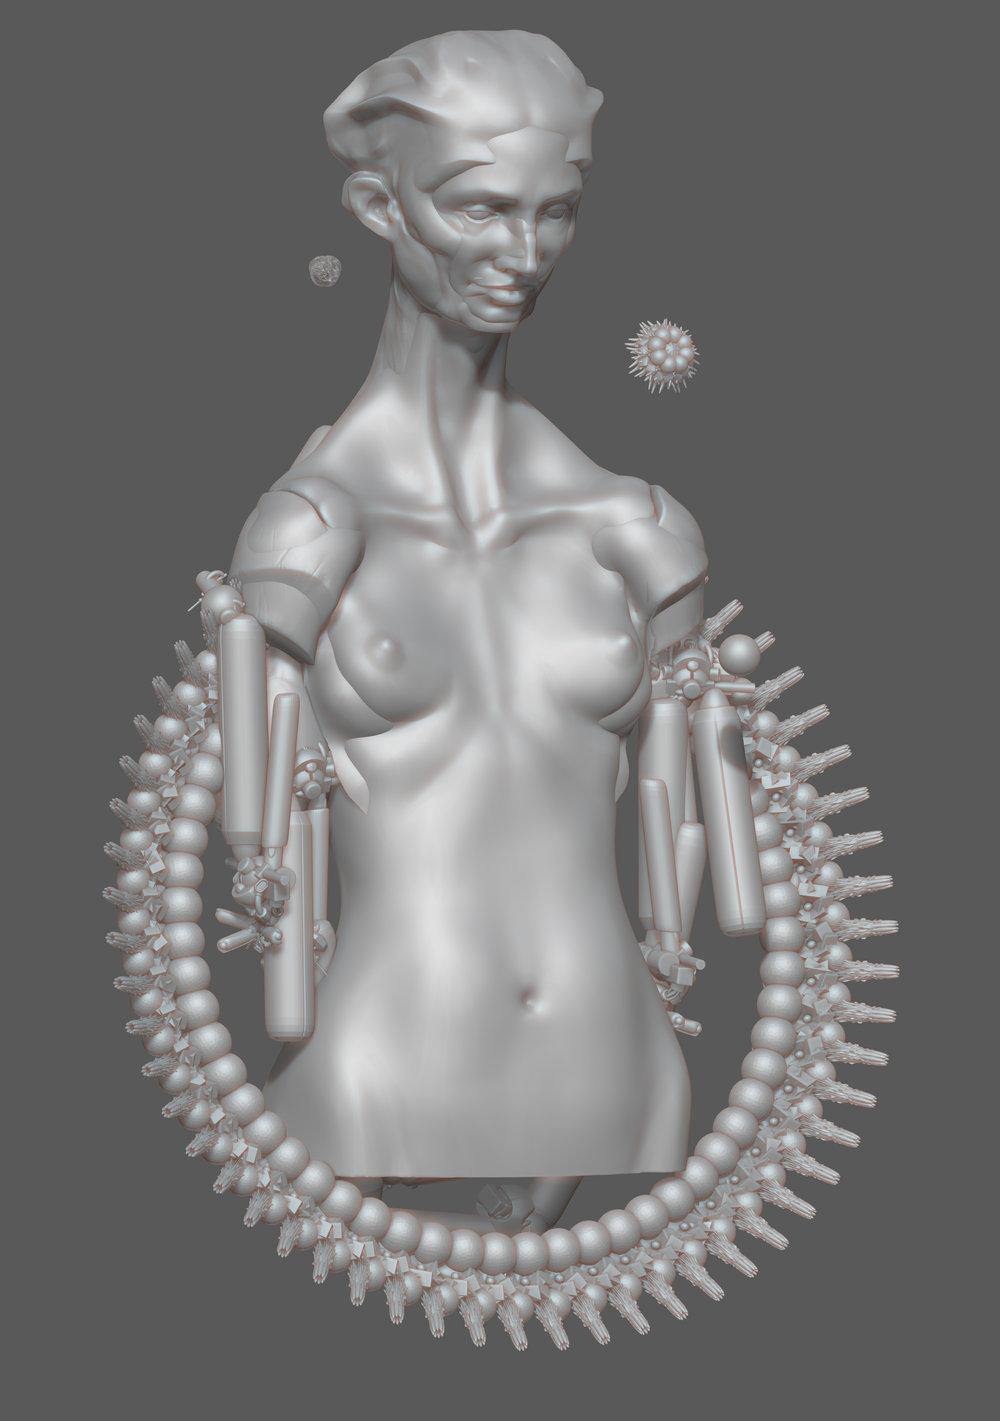 Max Brazier-Jones concept art cyber witch